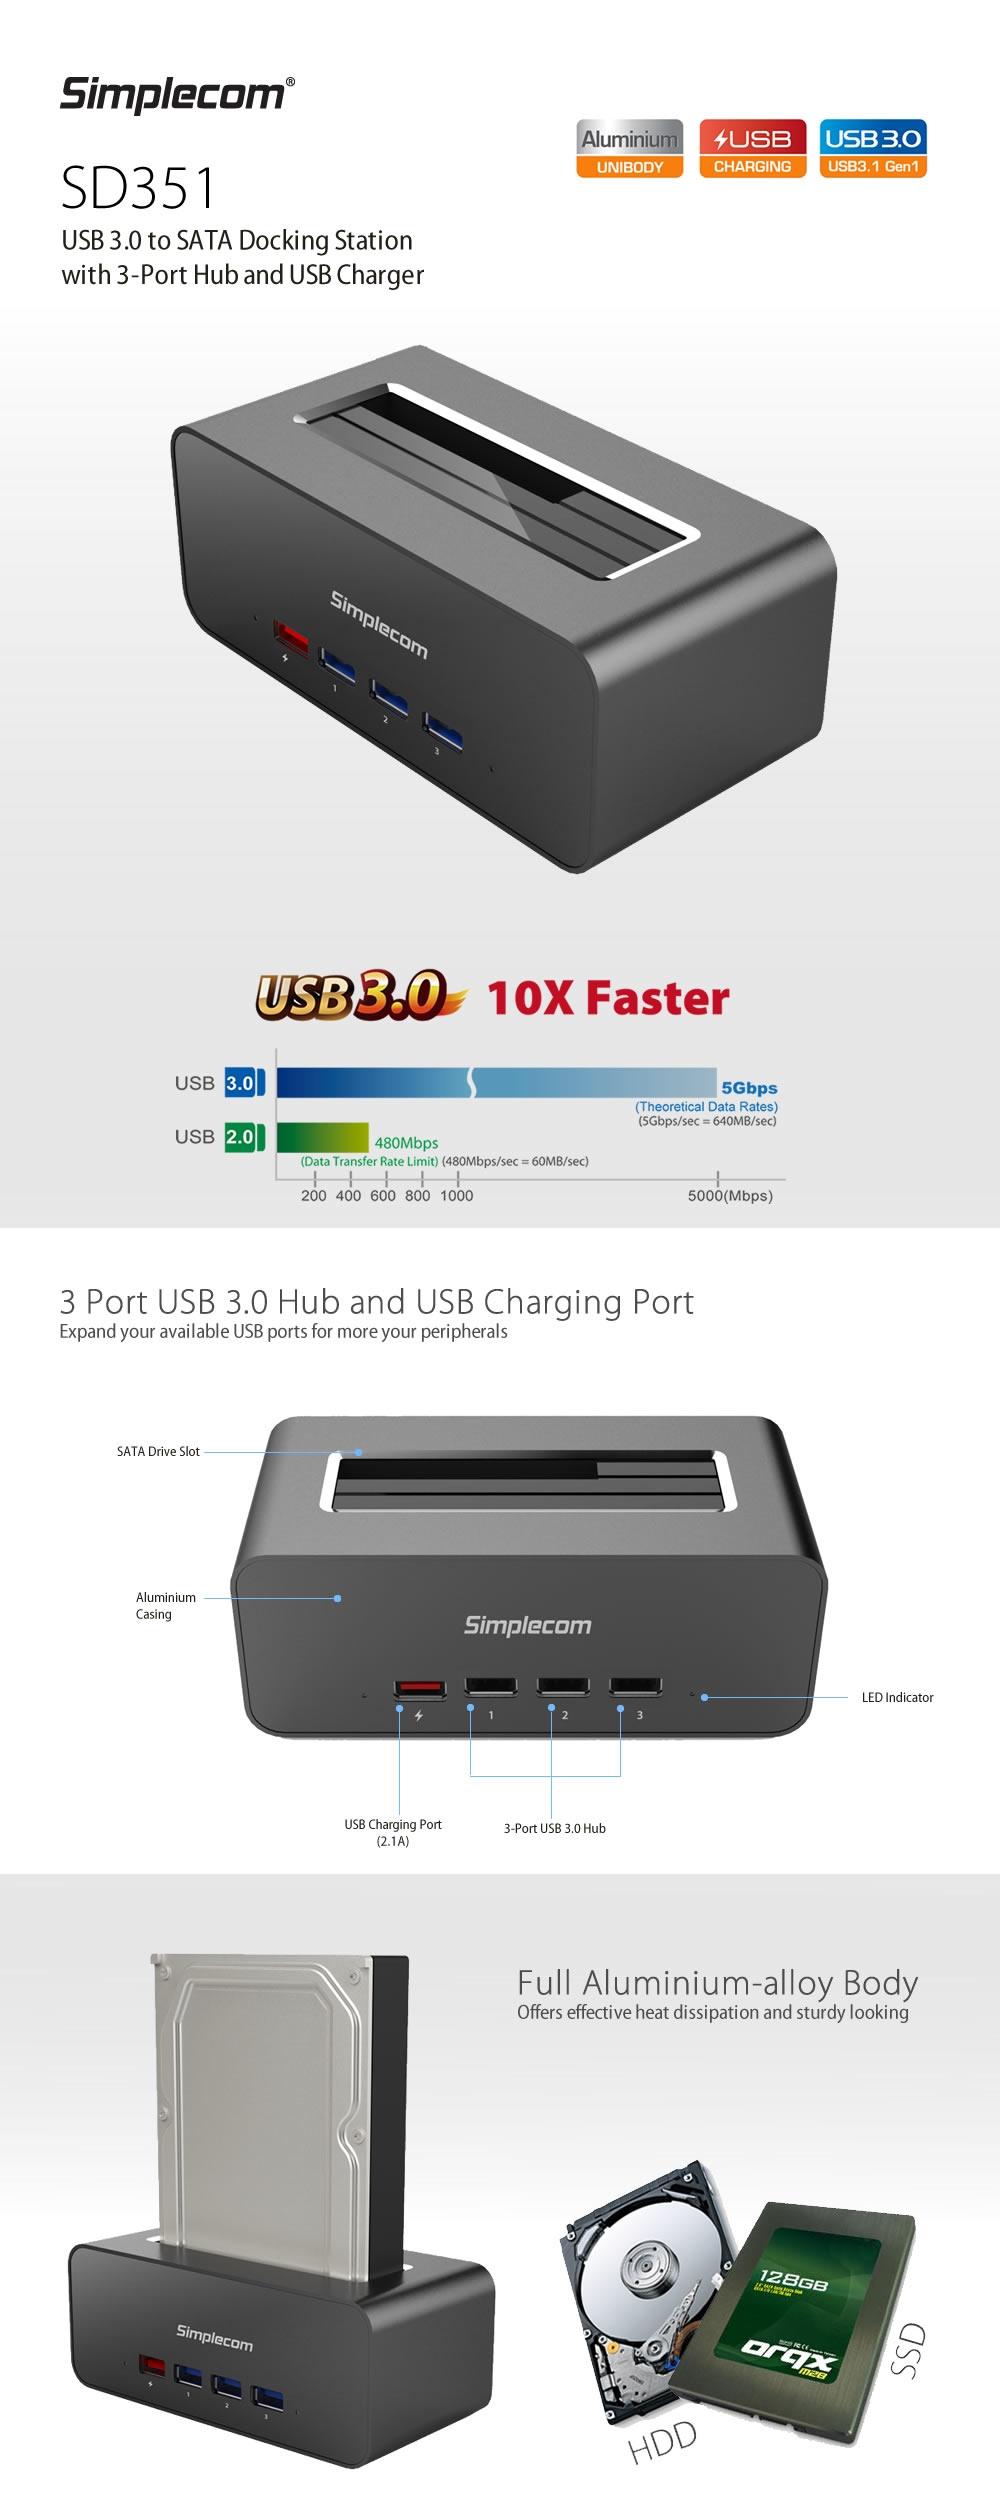 Simplecom SD351 USB 3.0 to SATA HDD Aluminium Docking Station - Desktop Overview 1